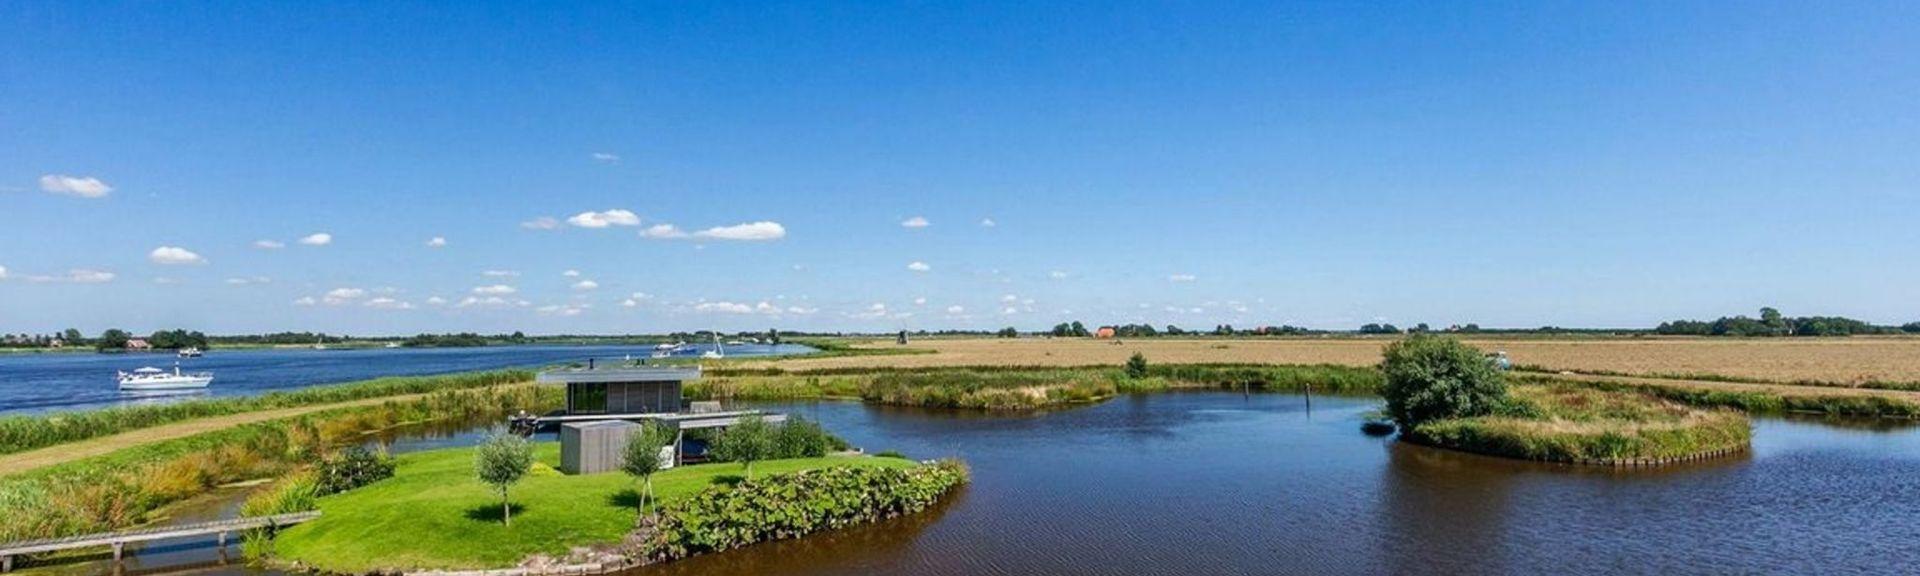 Drachten, Friesland, Netherlands